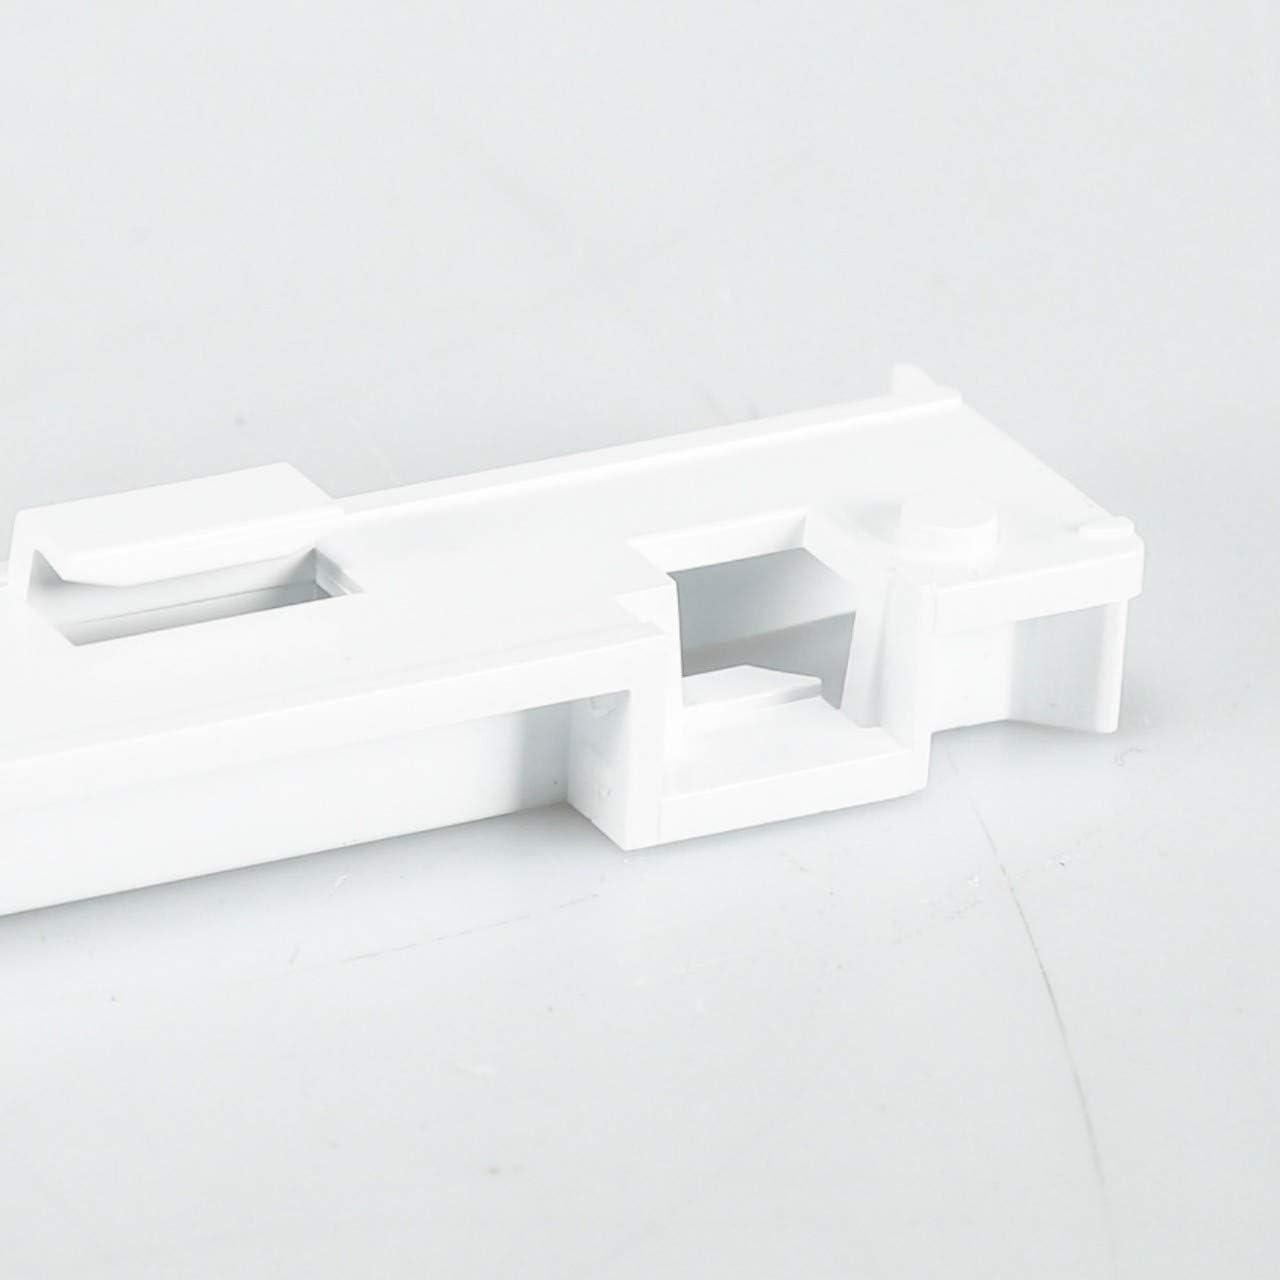 New Genuine OEM Whirlpool Refrigerator Drawer Slide Rail 2223320